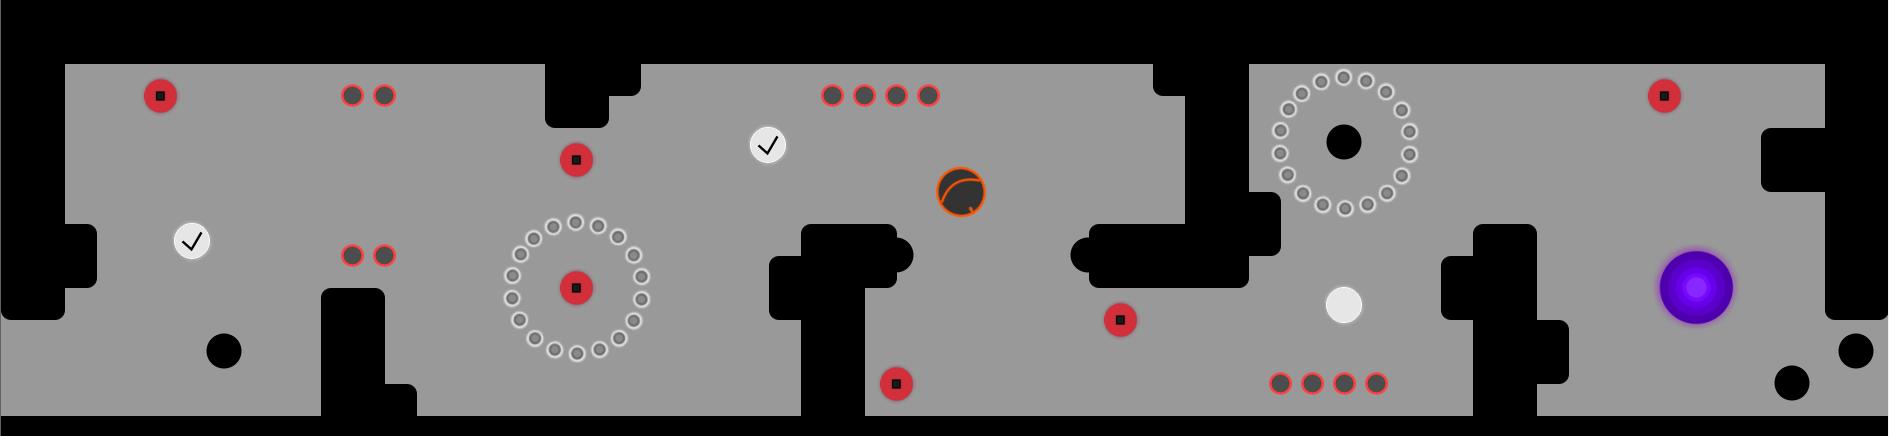 ArcTap demo